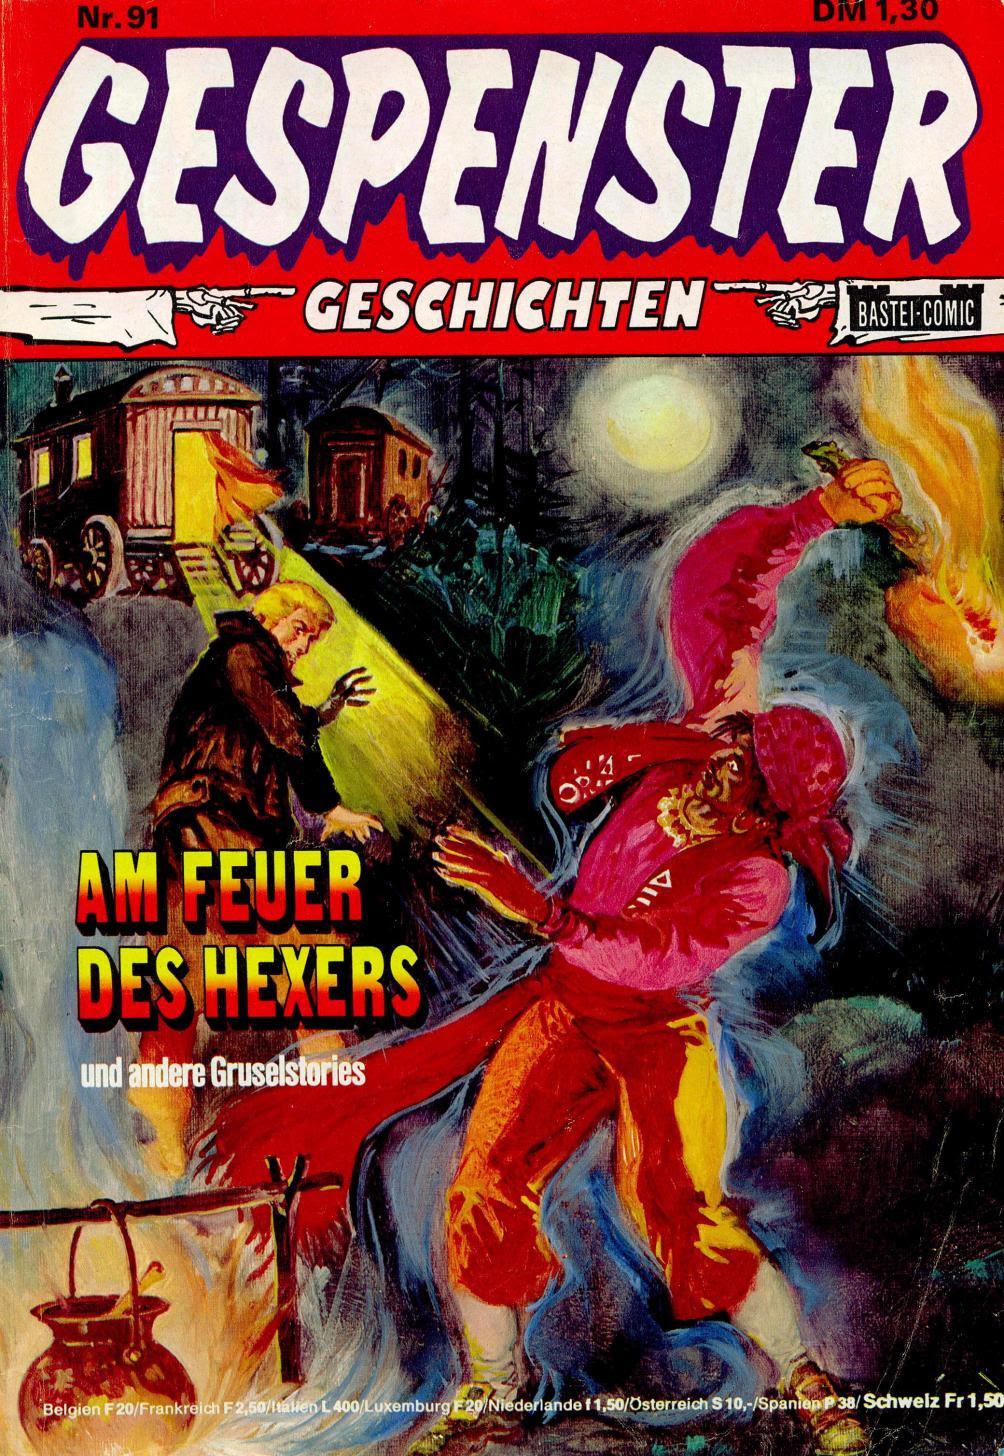 Gespenster Geschichten - 91